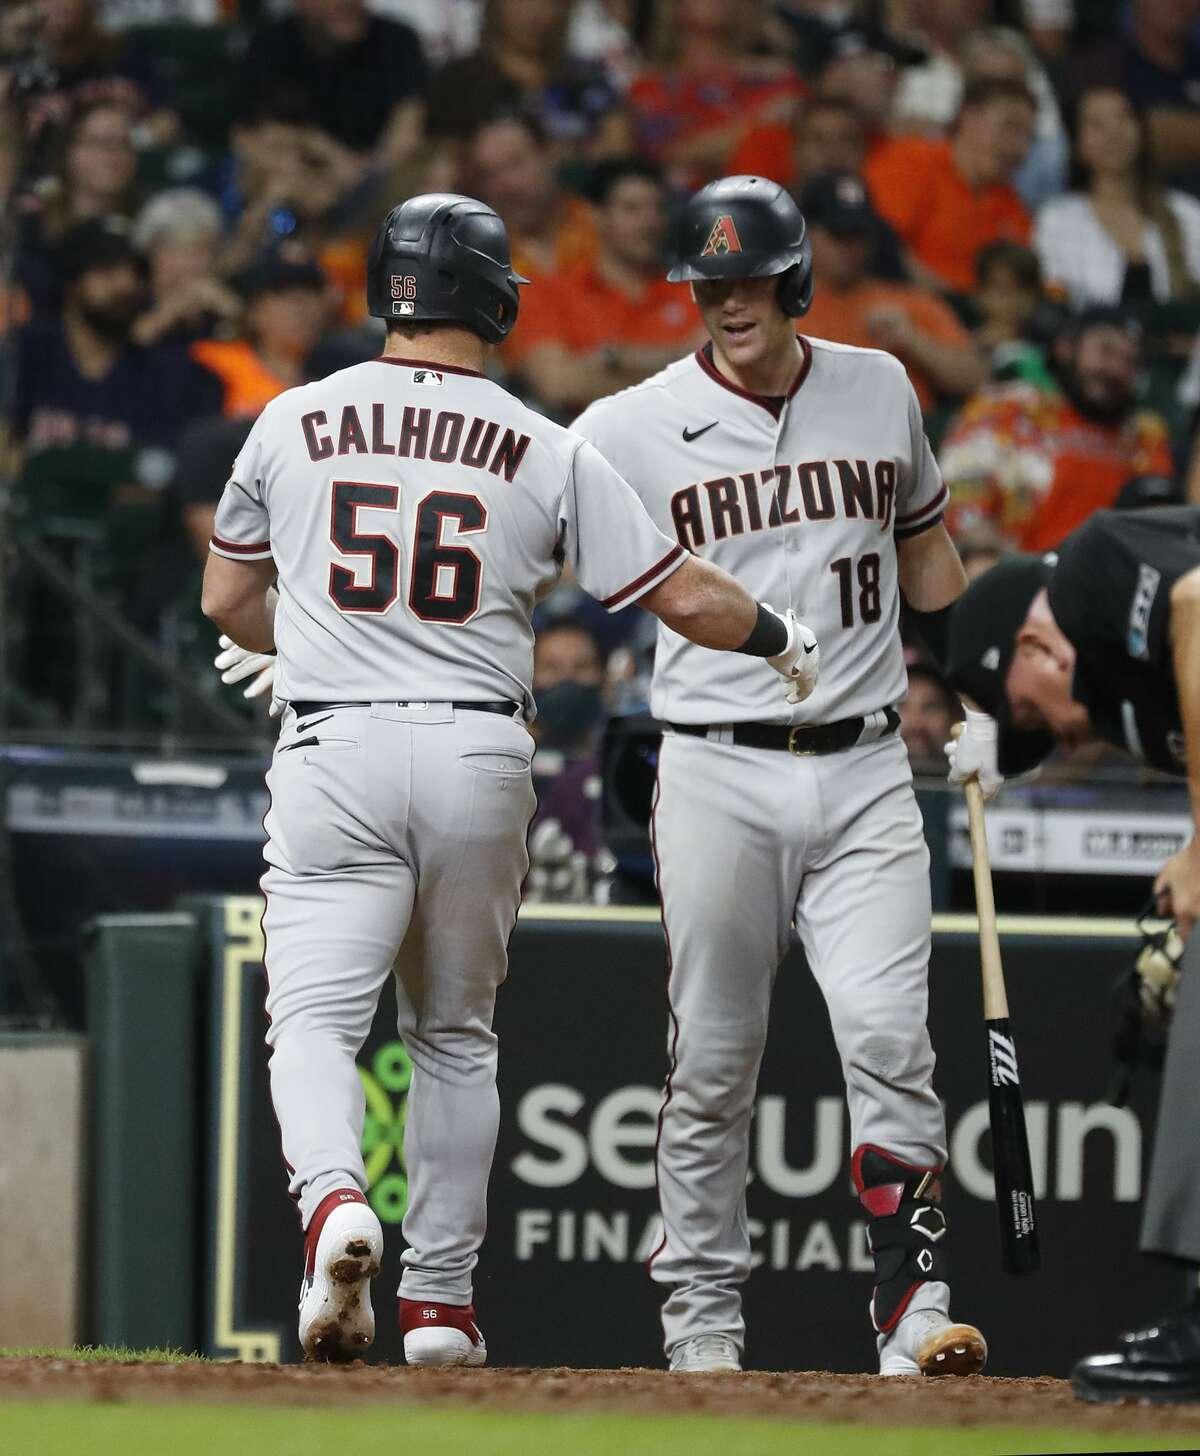 Arizona Diamondbacks designated hitter Kole Calhoun (56) celebrates his home runwith Carson Kelly (18) during the sixth inning of an MLB baseball game at Minute Maid Park, Friday, September 17, 2021, in Houston.